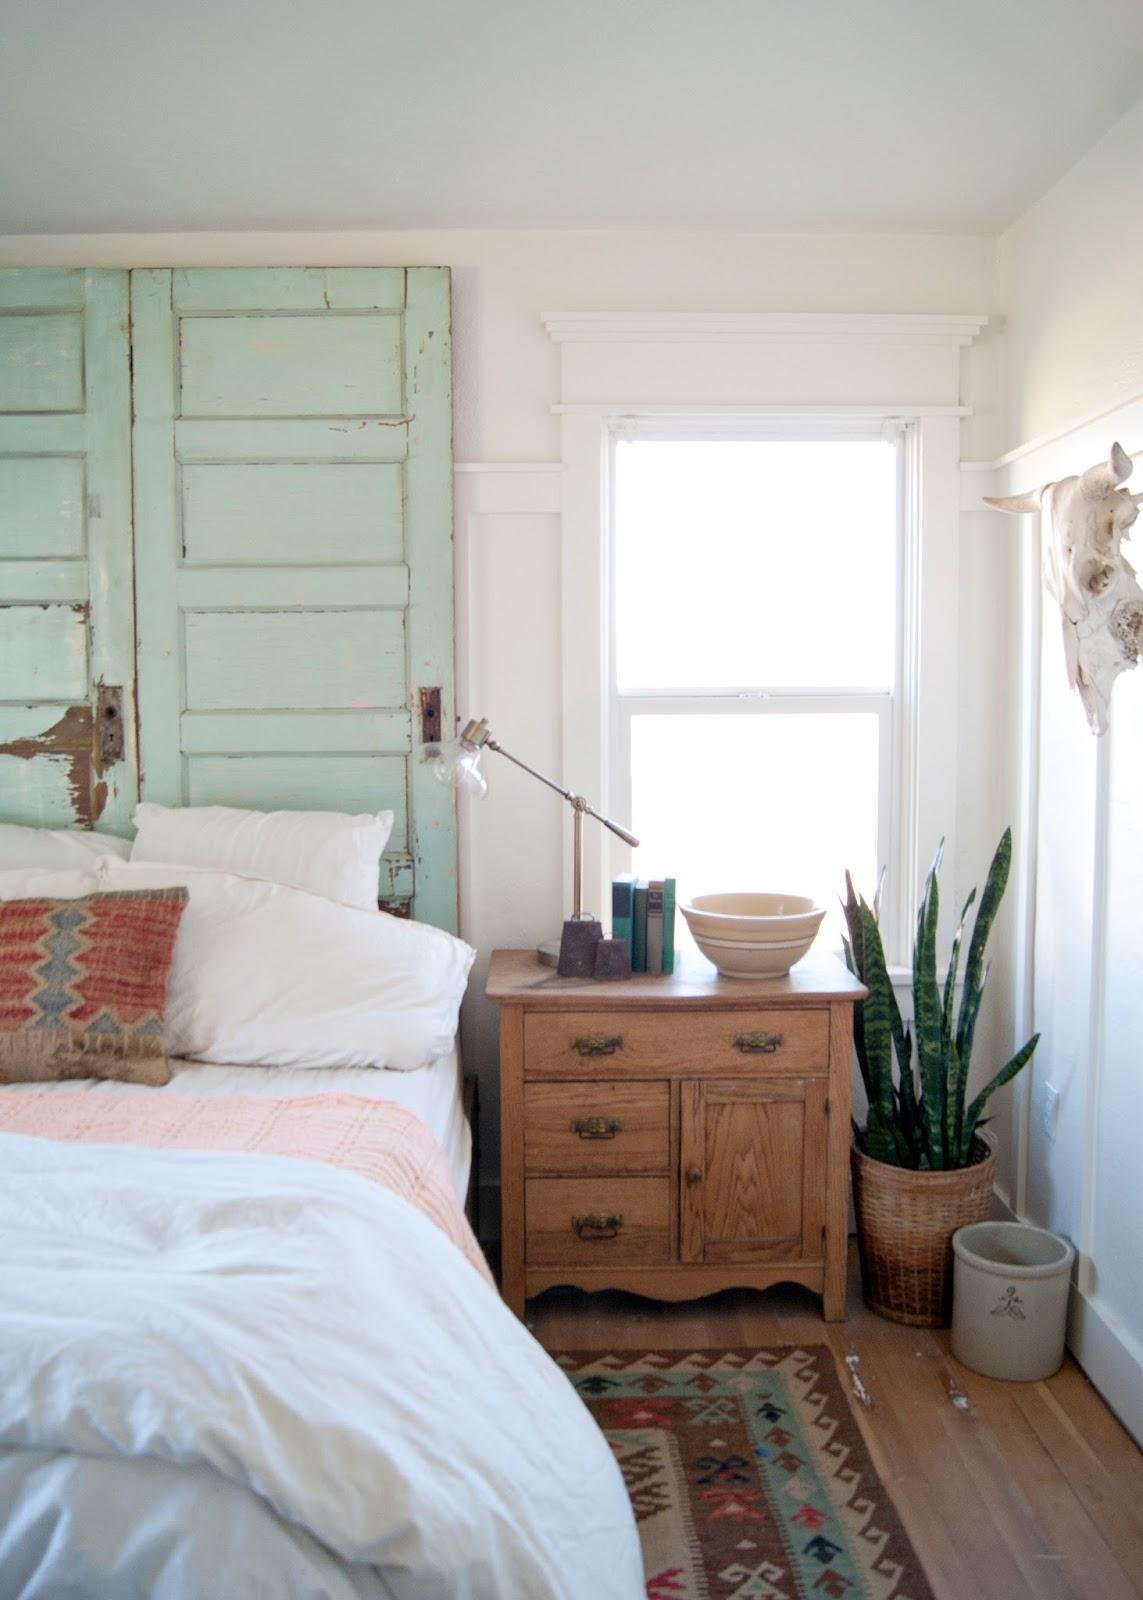 Farmhouse Master Bedroom Reveal - One Room Challenge ... on Master Bedroom Farmhouse Bedroom Images  id=44774